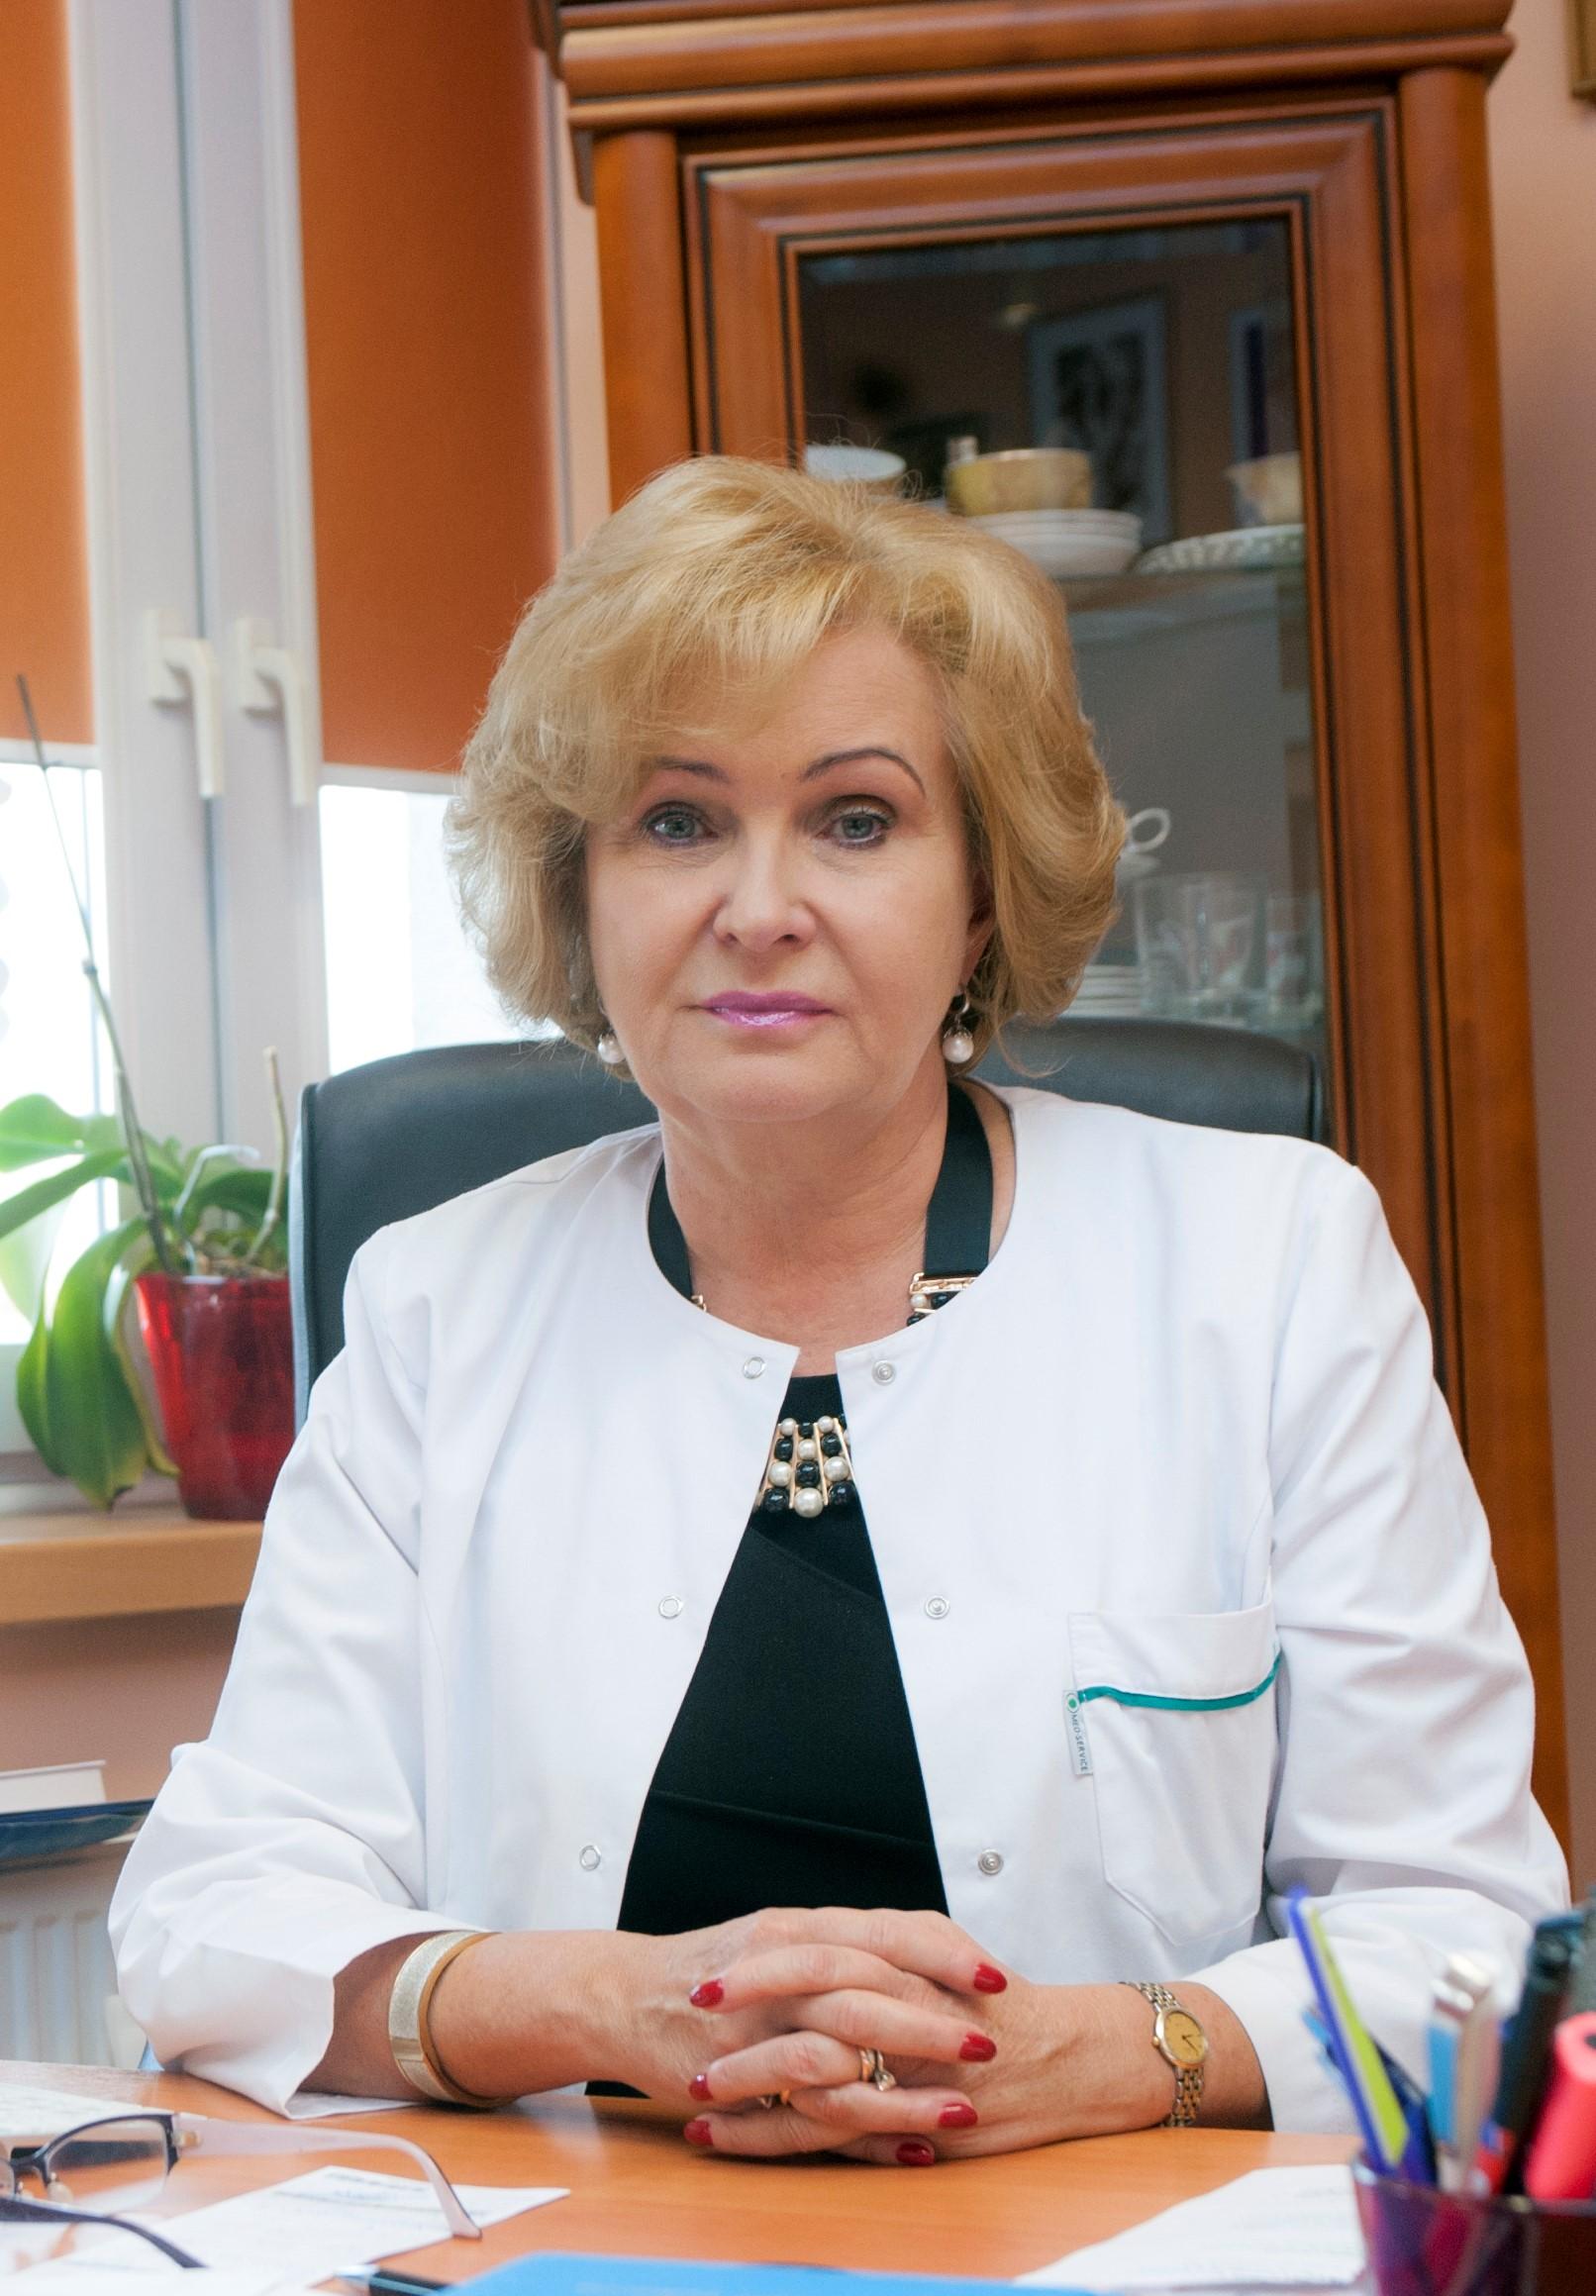 ZDJ PANI PROF.Rydzewska